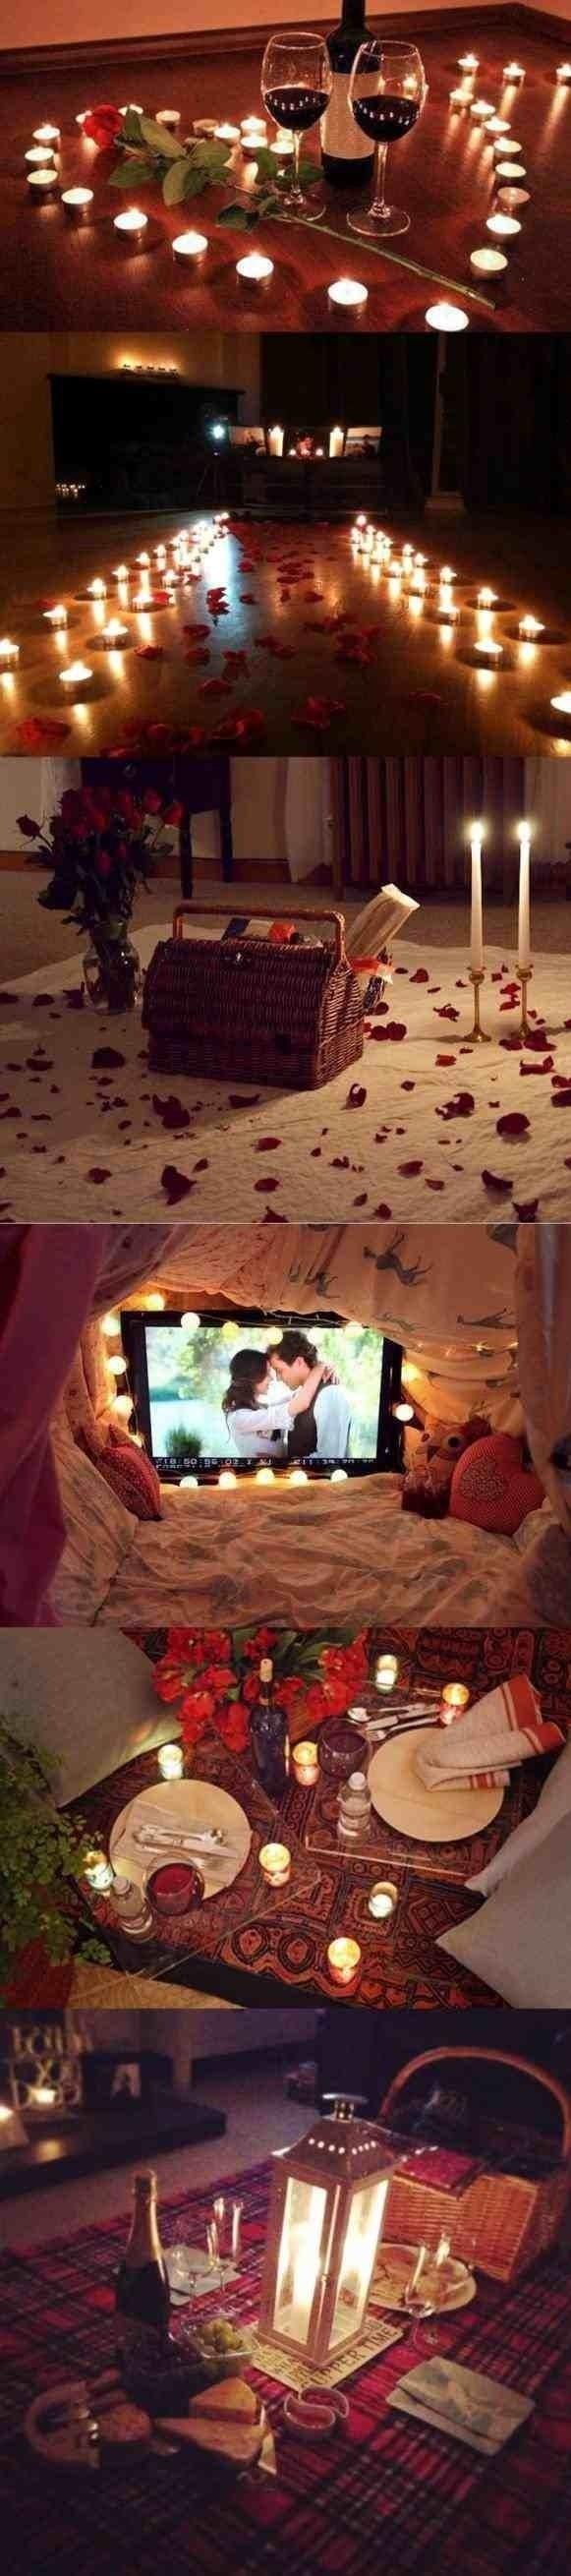 new post romantic date ideas your girlfriend   mb   pinterest